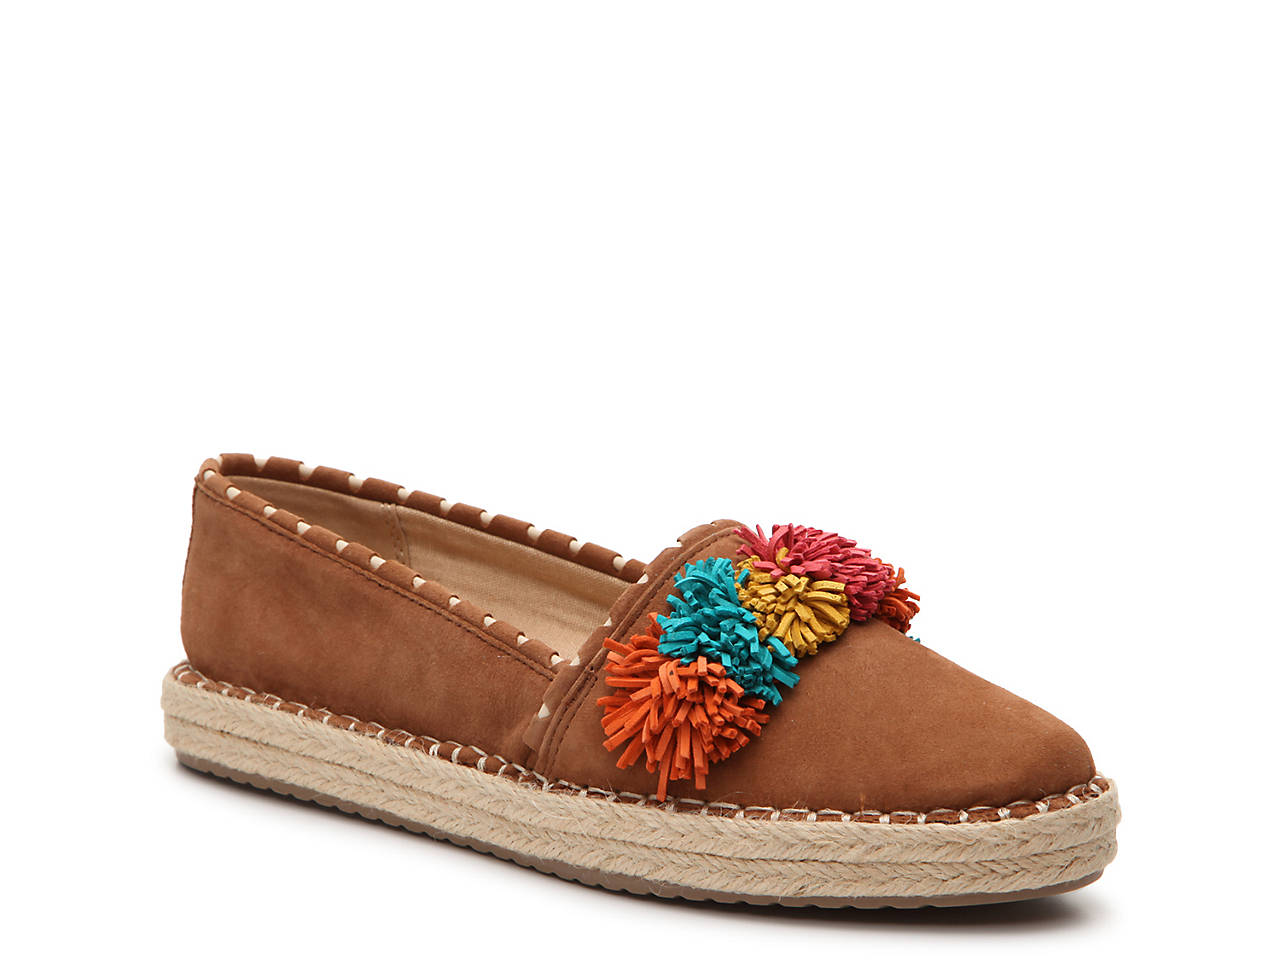 a0fed81d75e595 Sam Edelman Issa Espadrille Flat Women s Shoes